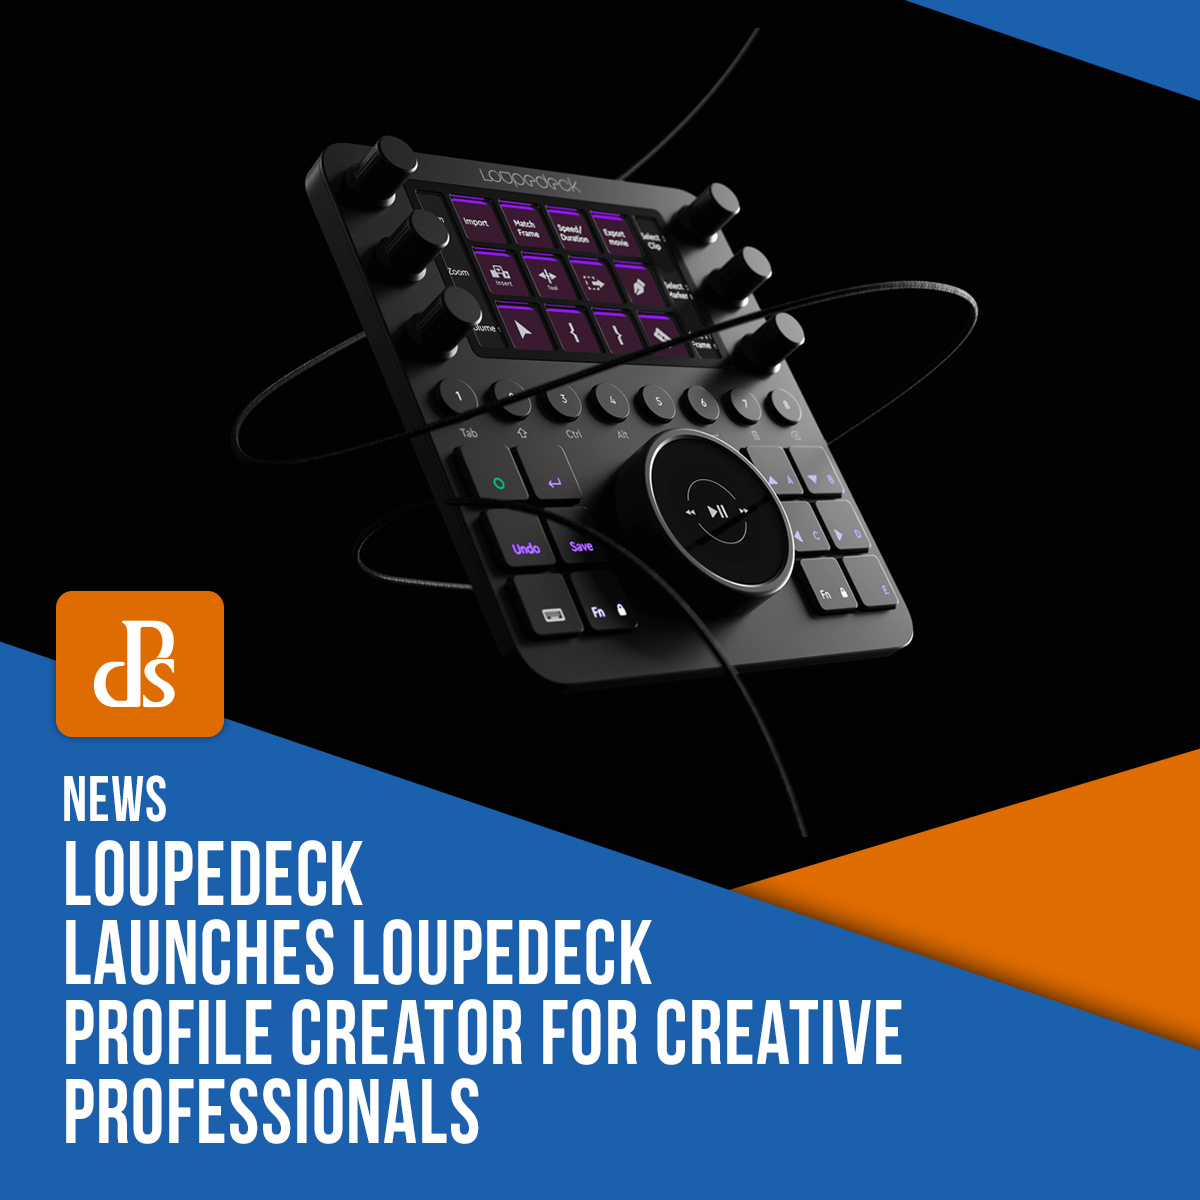 Loupedeck Launches Loupedeck Profile Creator for Creative Professionals